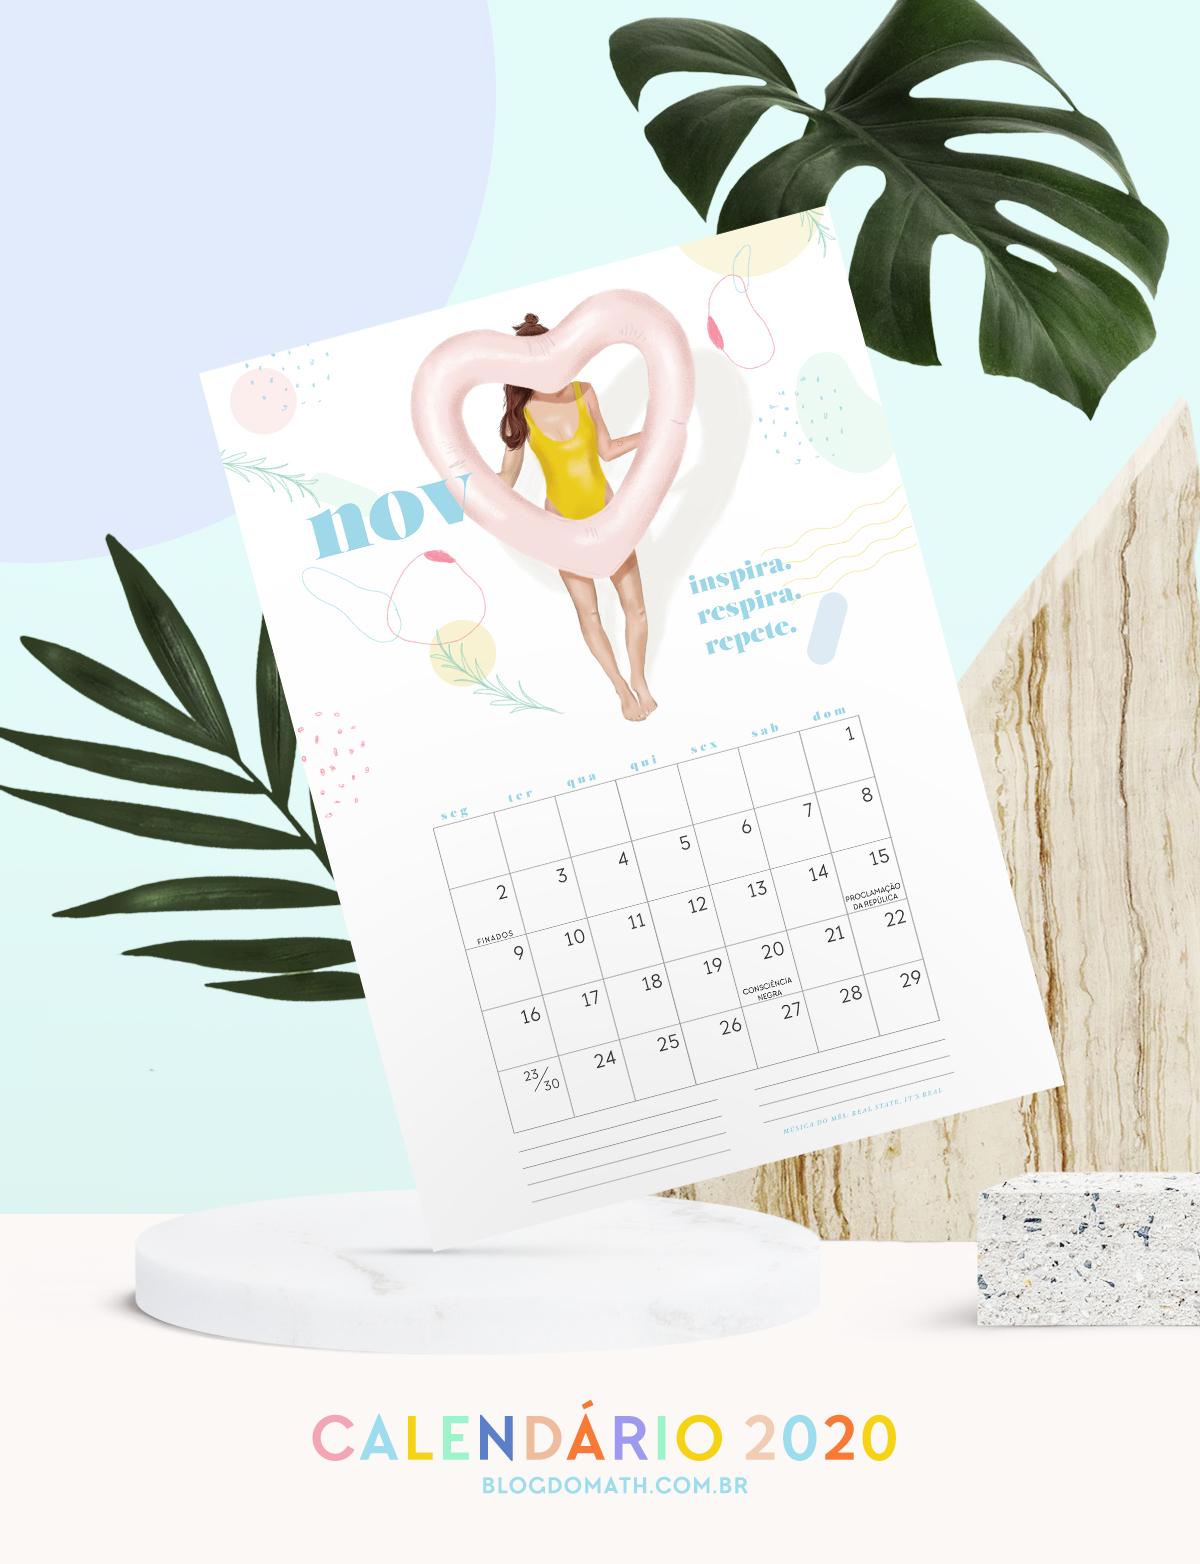 2020 printable colorful illustrated calendar